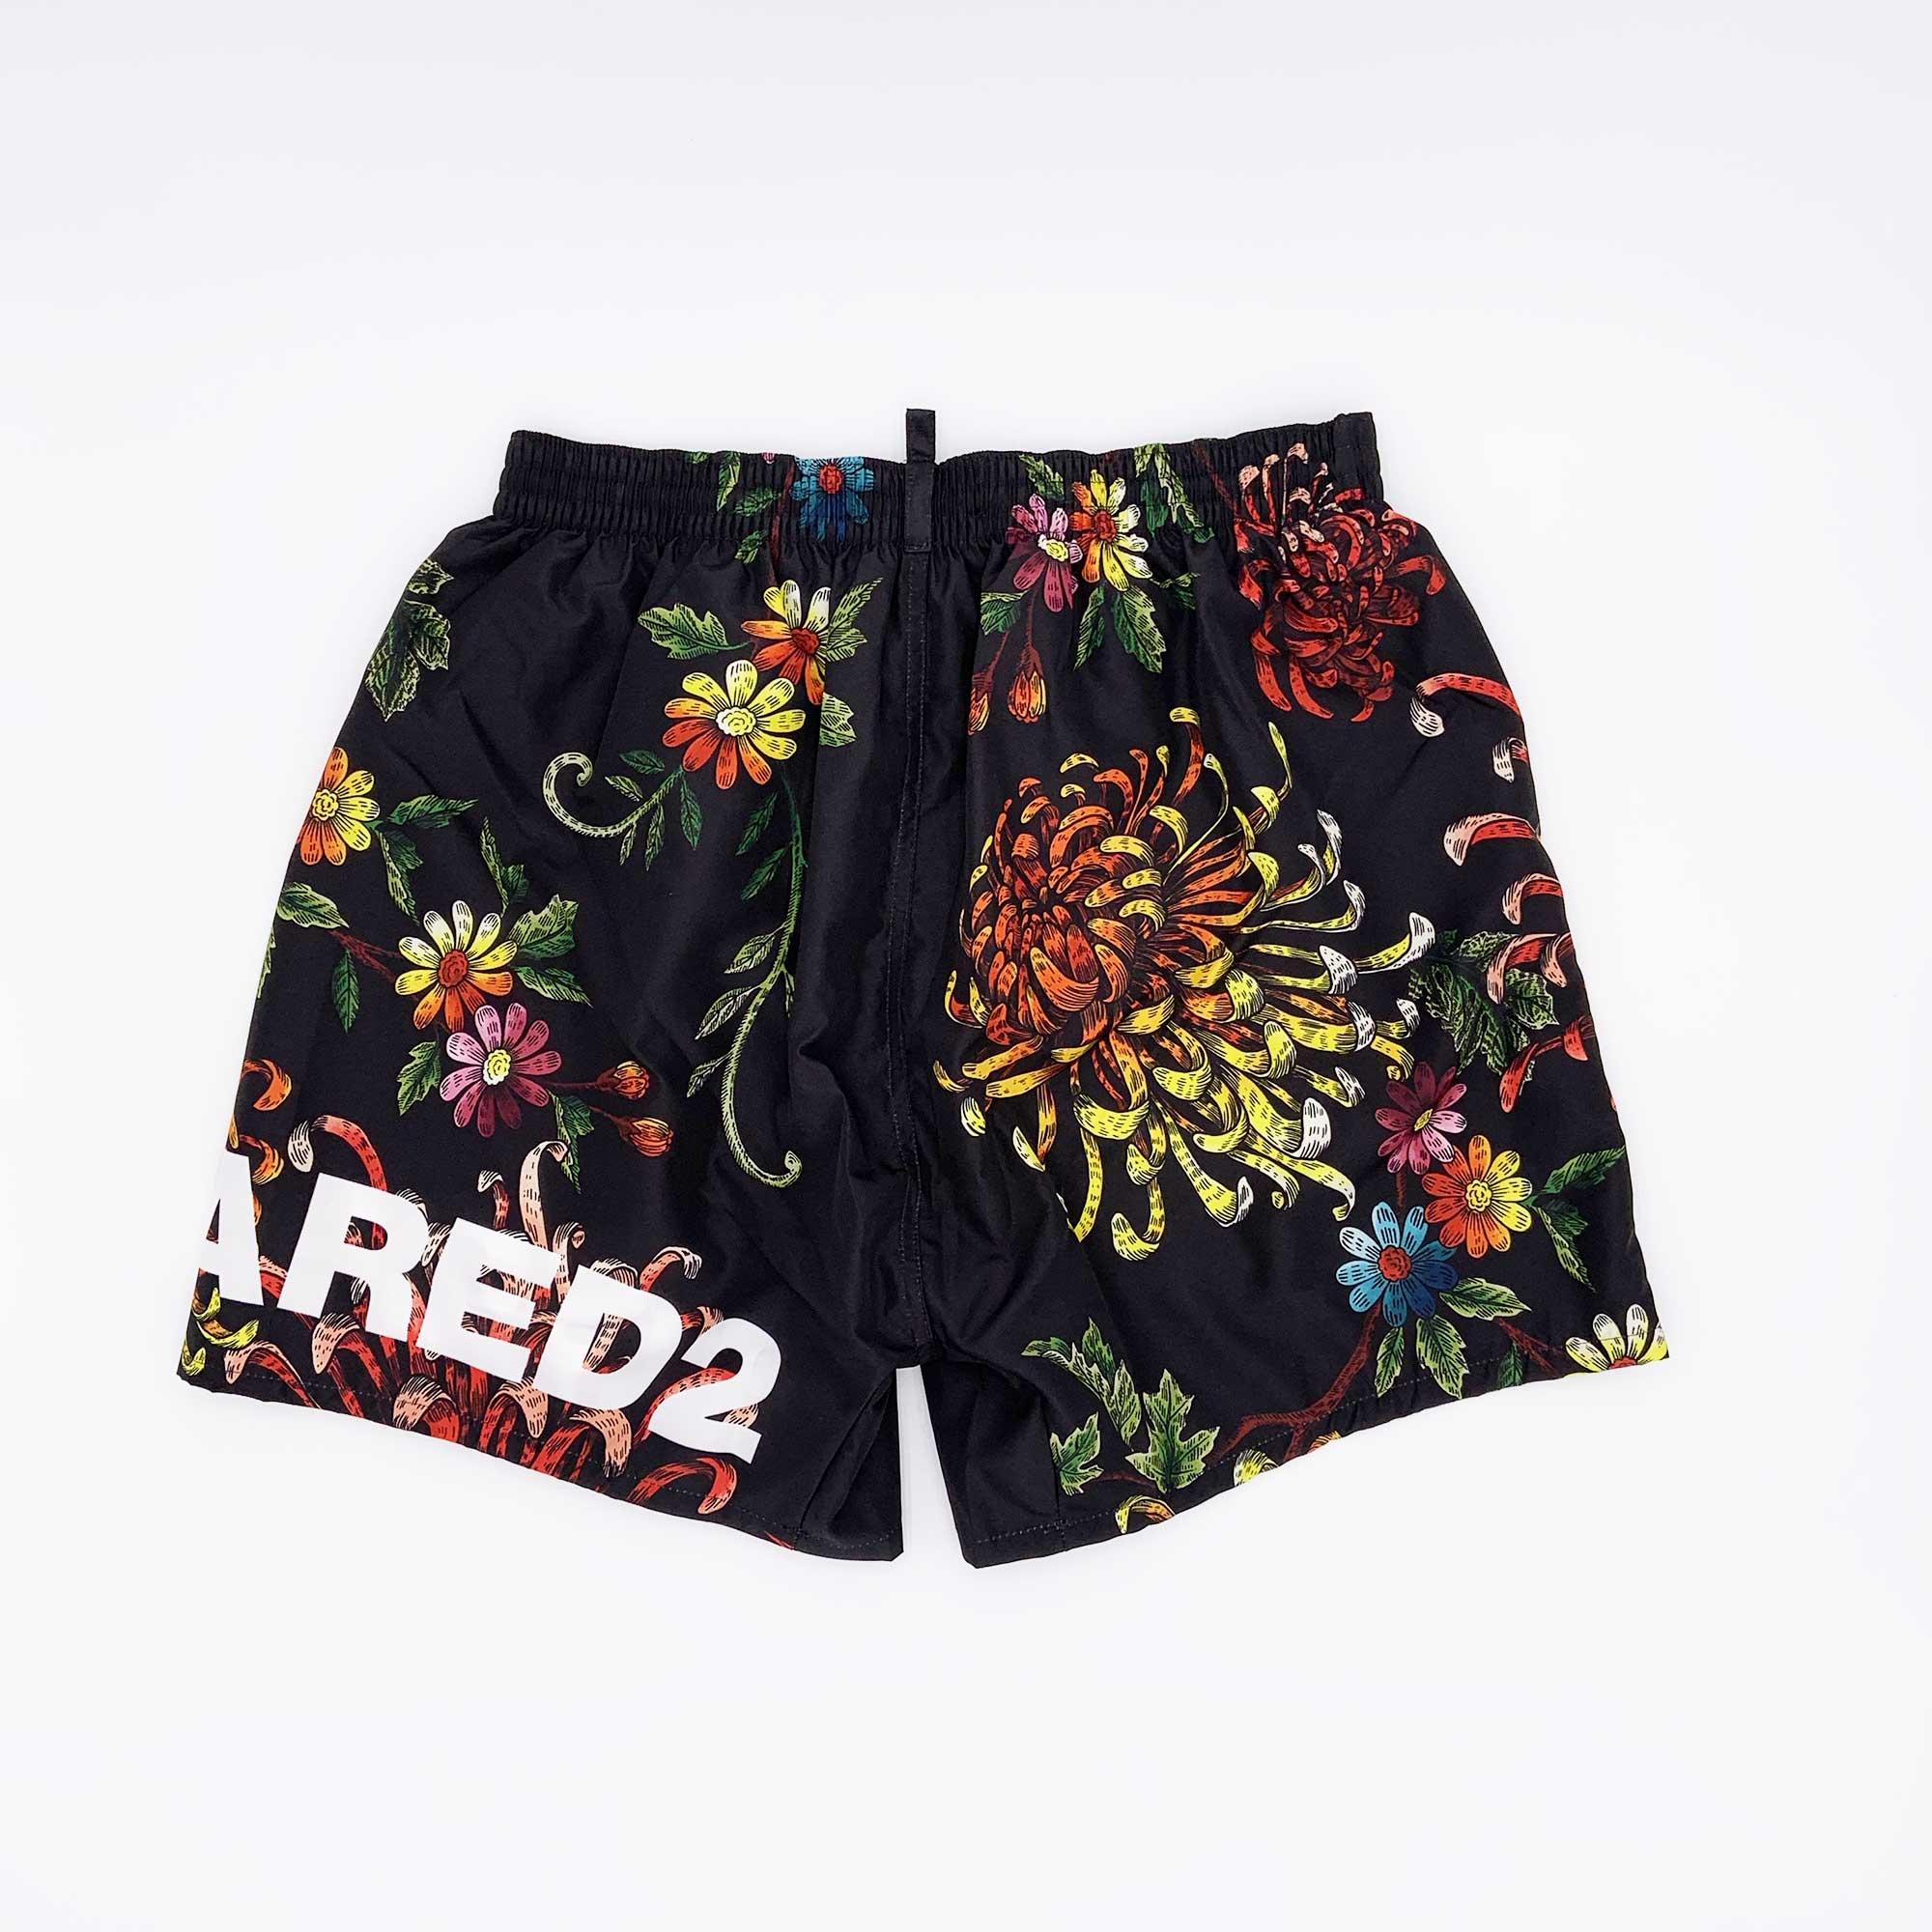 Costume pantaloncino stampa floreale - Nero